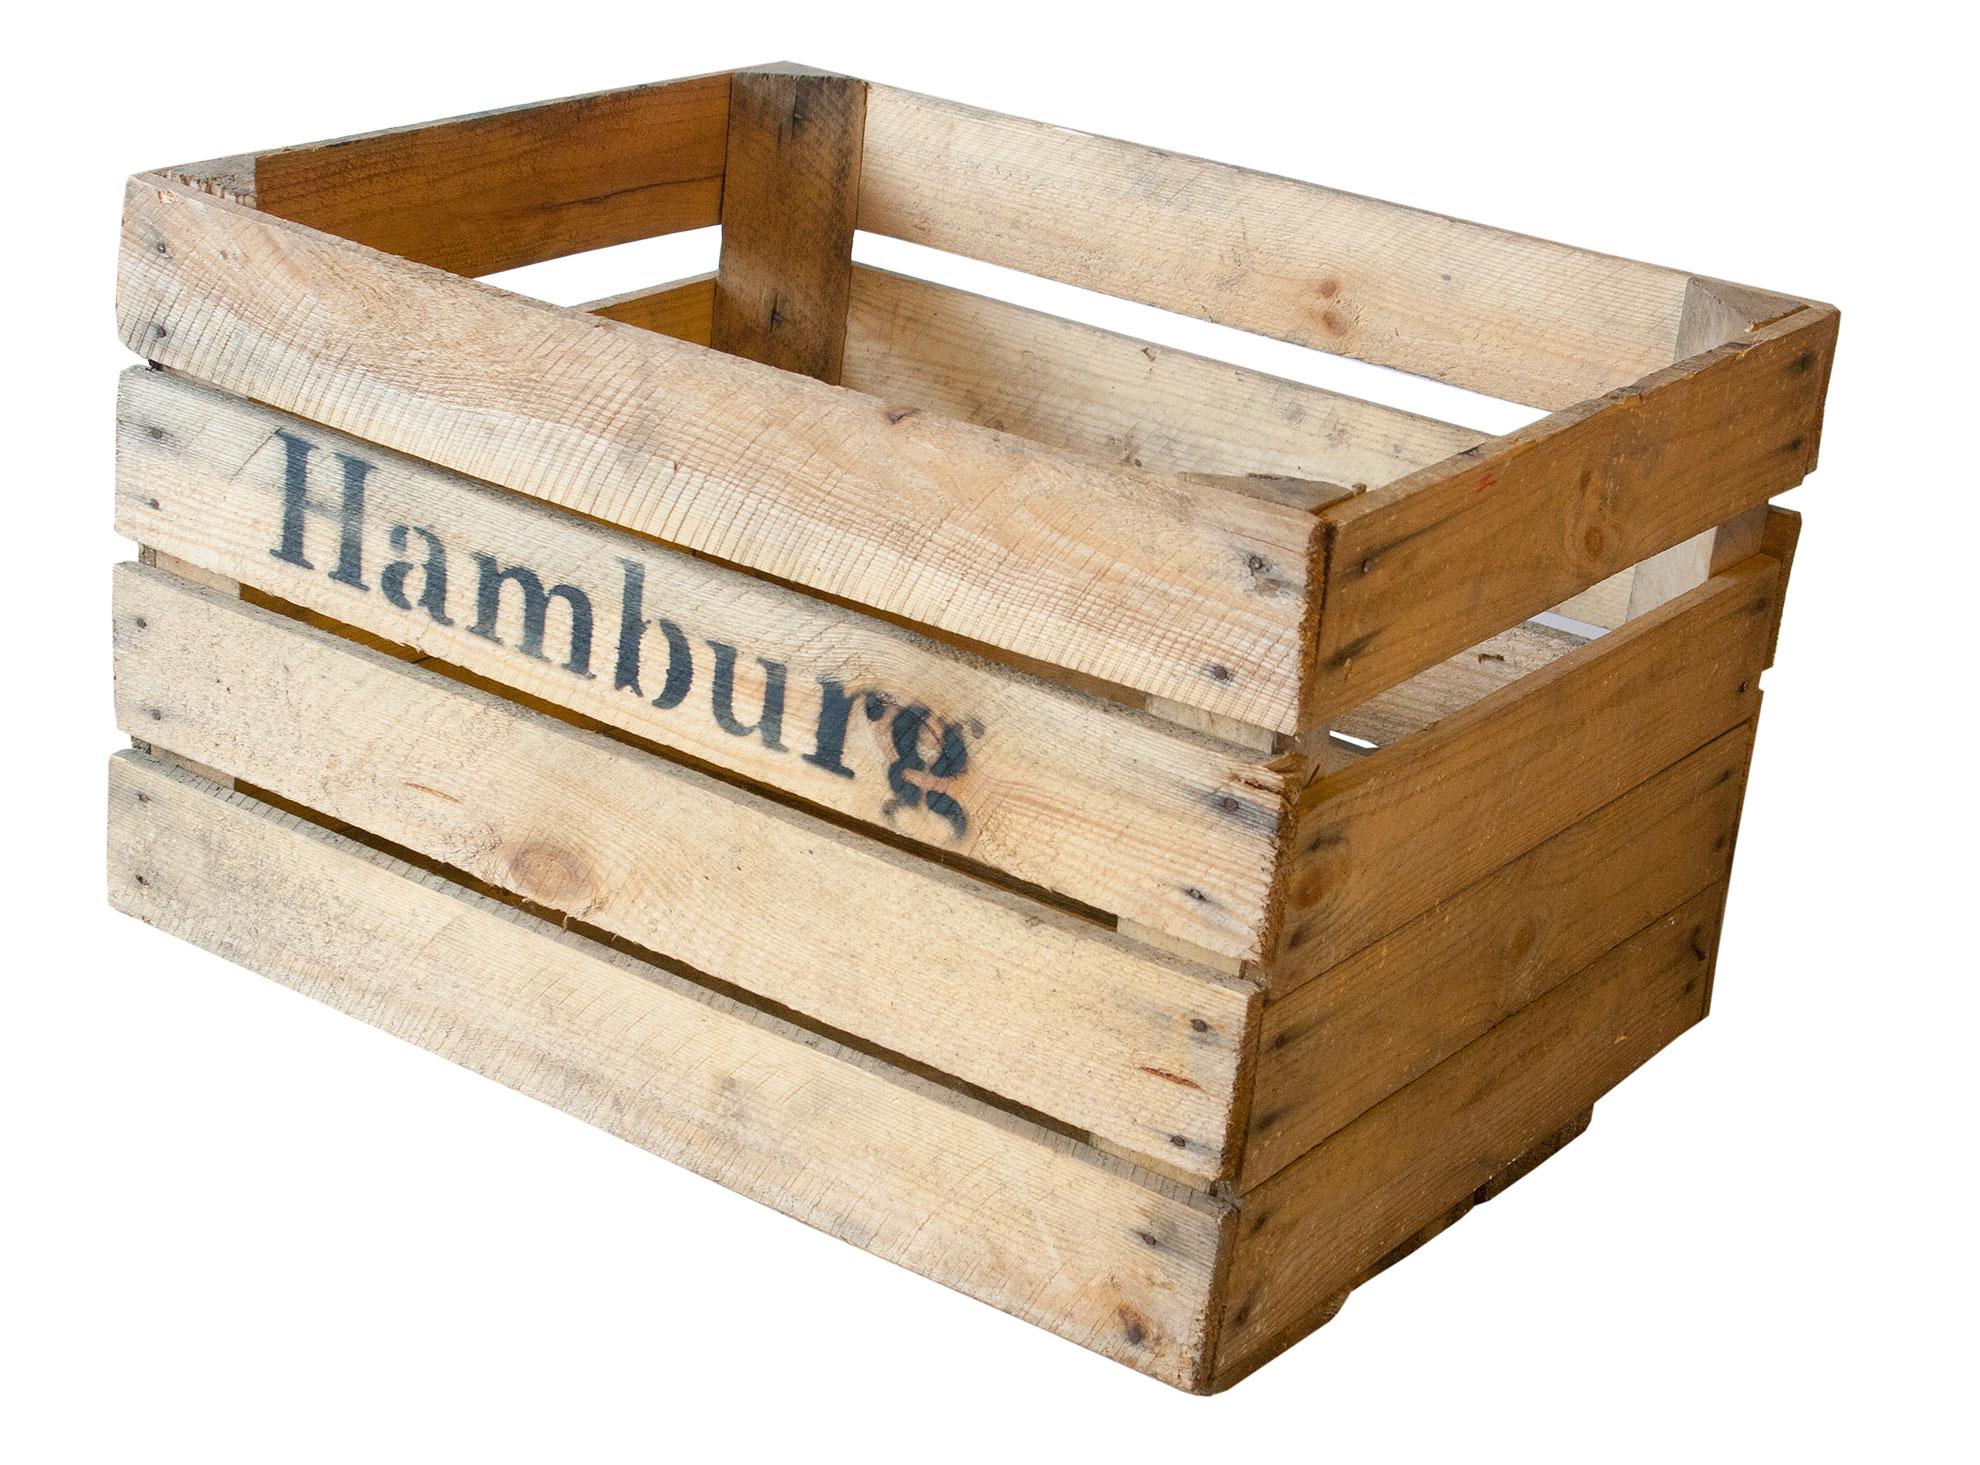 obstkisten apfelkiste hamburg natur 50x40x30cm. Black Bedroom Furniture Sets. Home Design Ideas